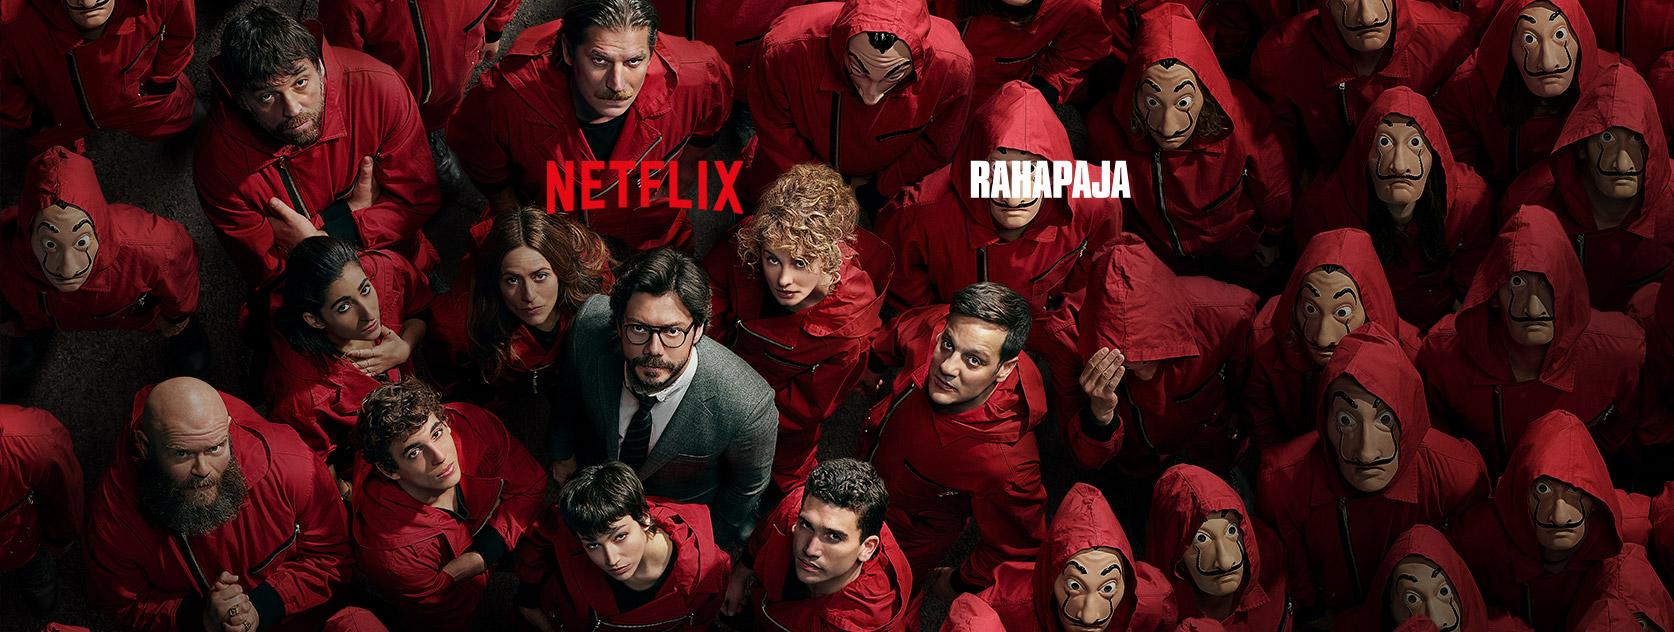 Netflix Rahapaja